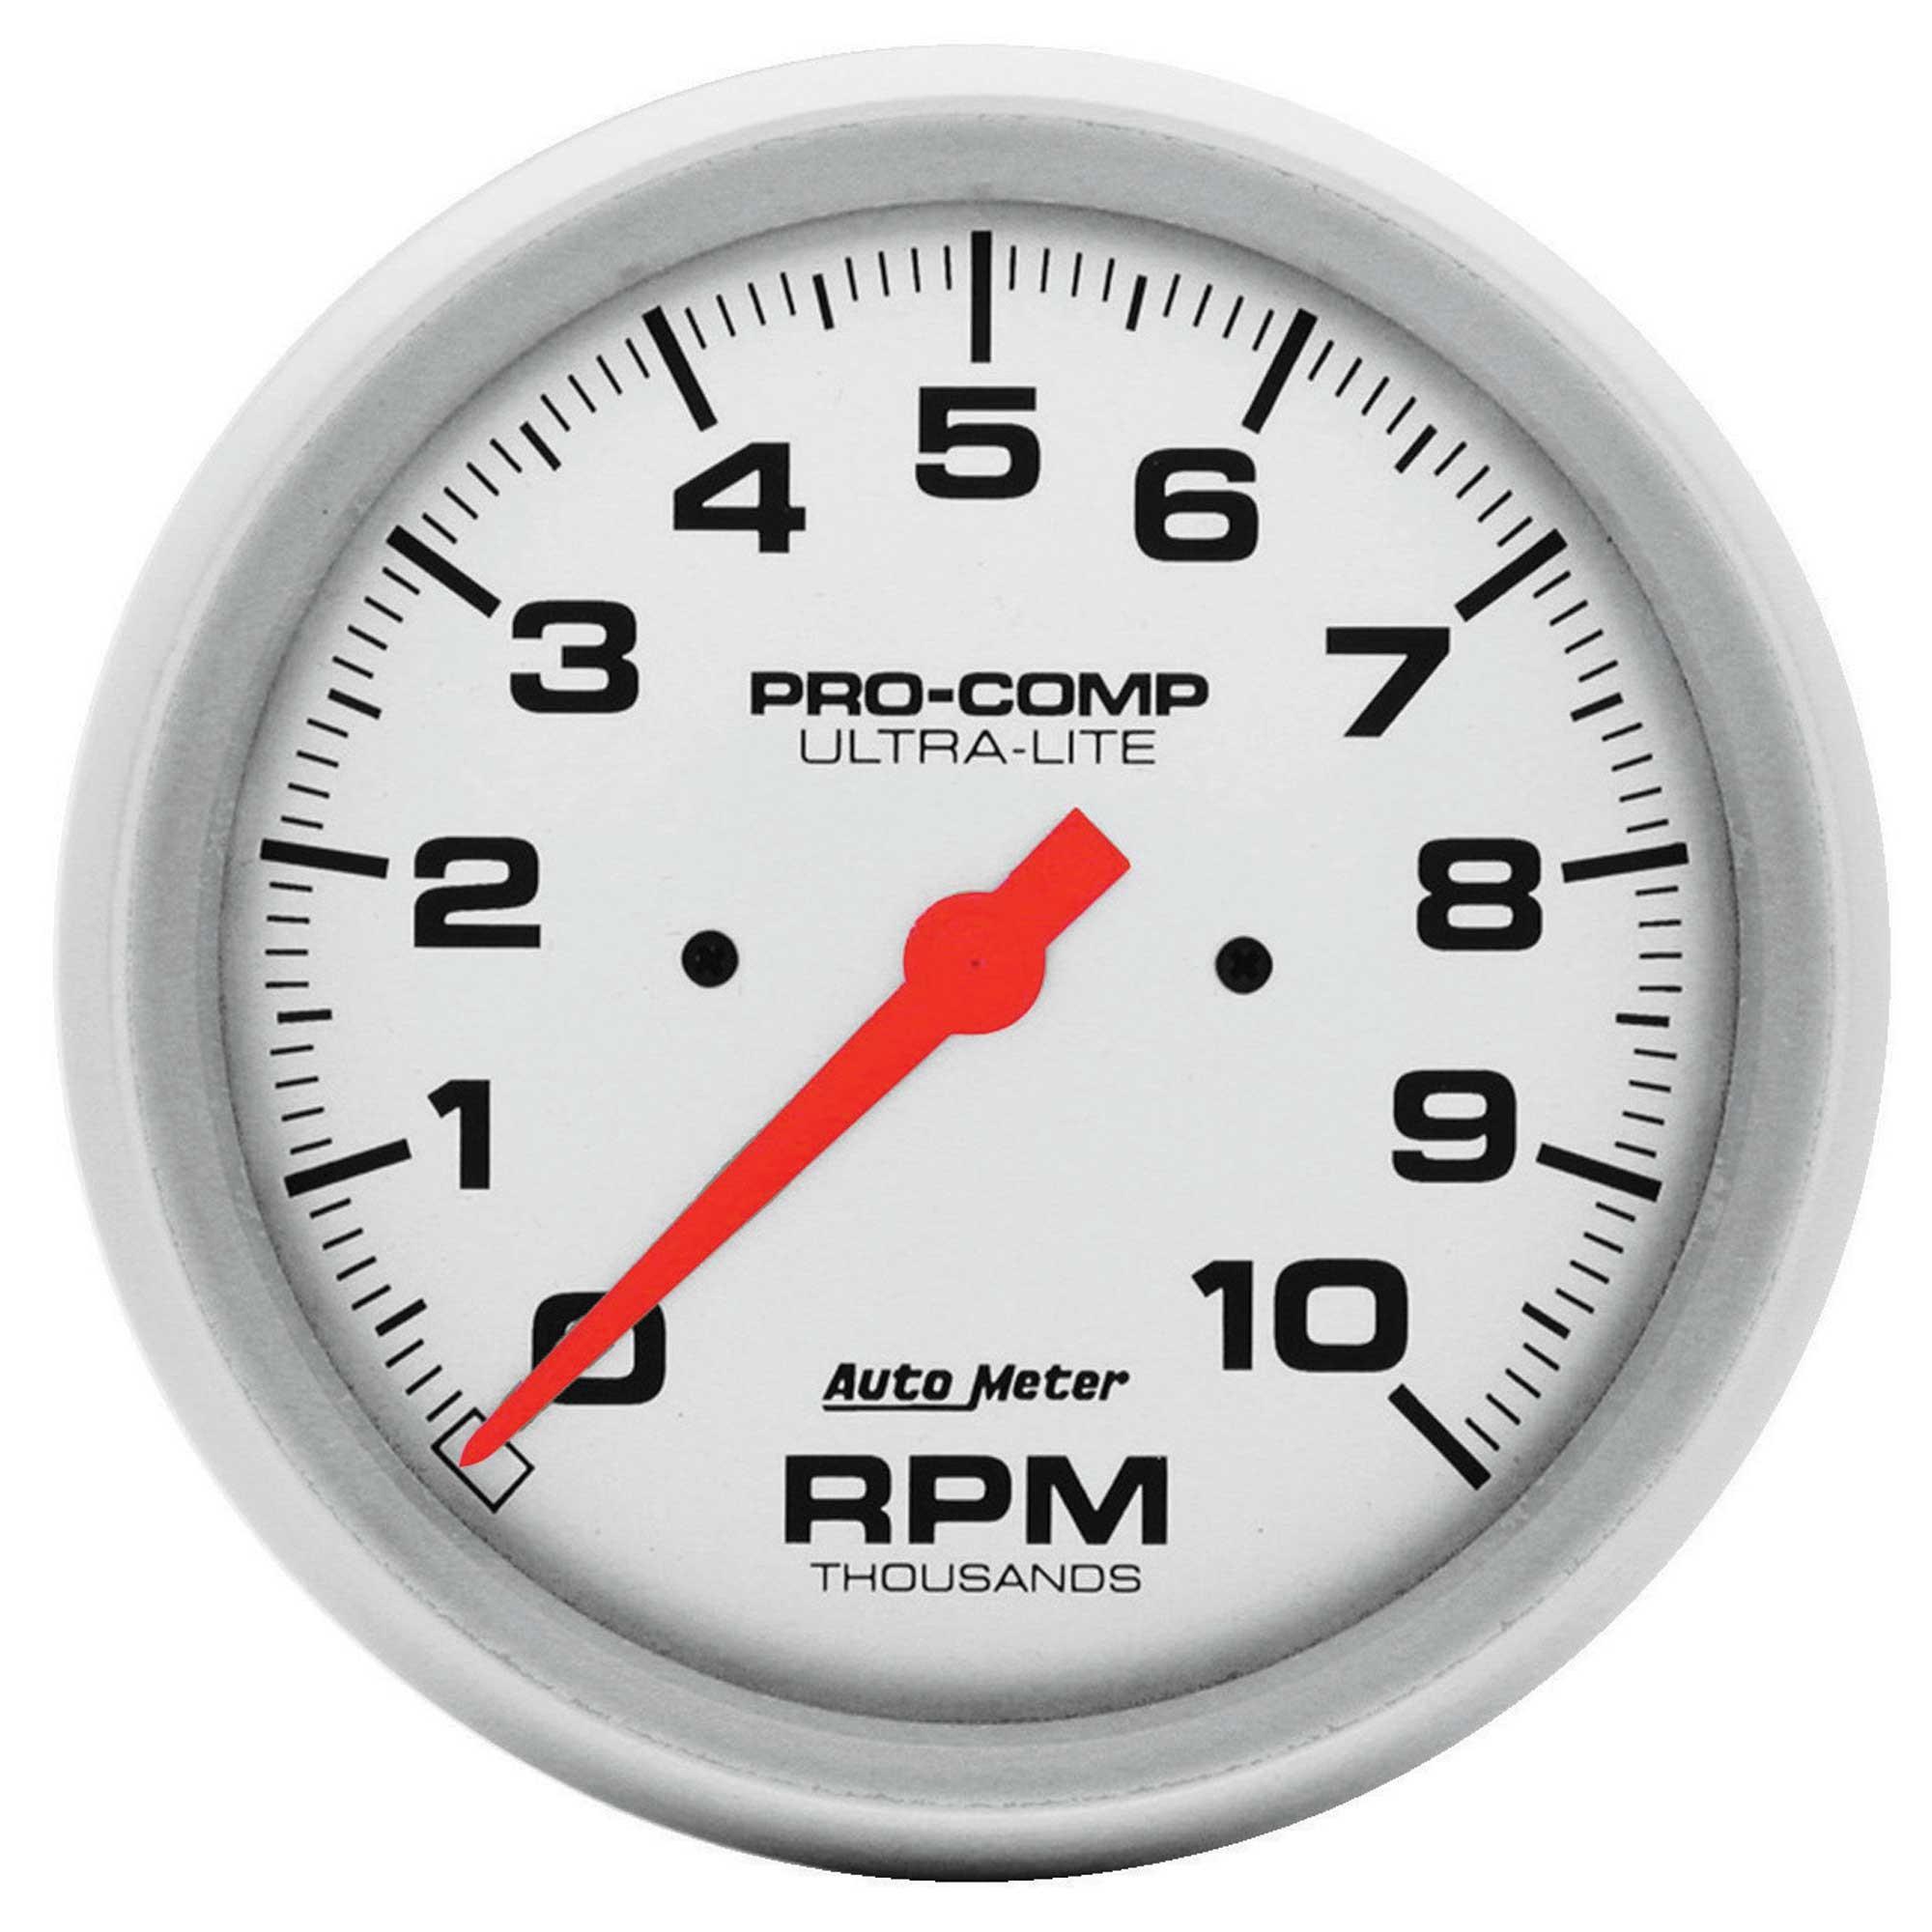 Vdo Oil Electric Gauge Diagram No 0765] Tachometer Wiring Diagram Also Auto Meter Volt Of Vdo Oil Electric Gauge Diagram